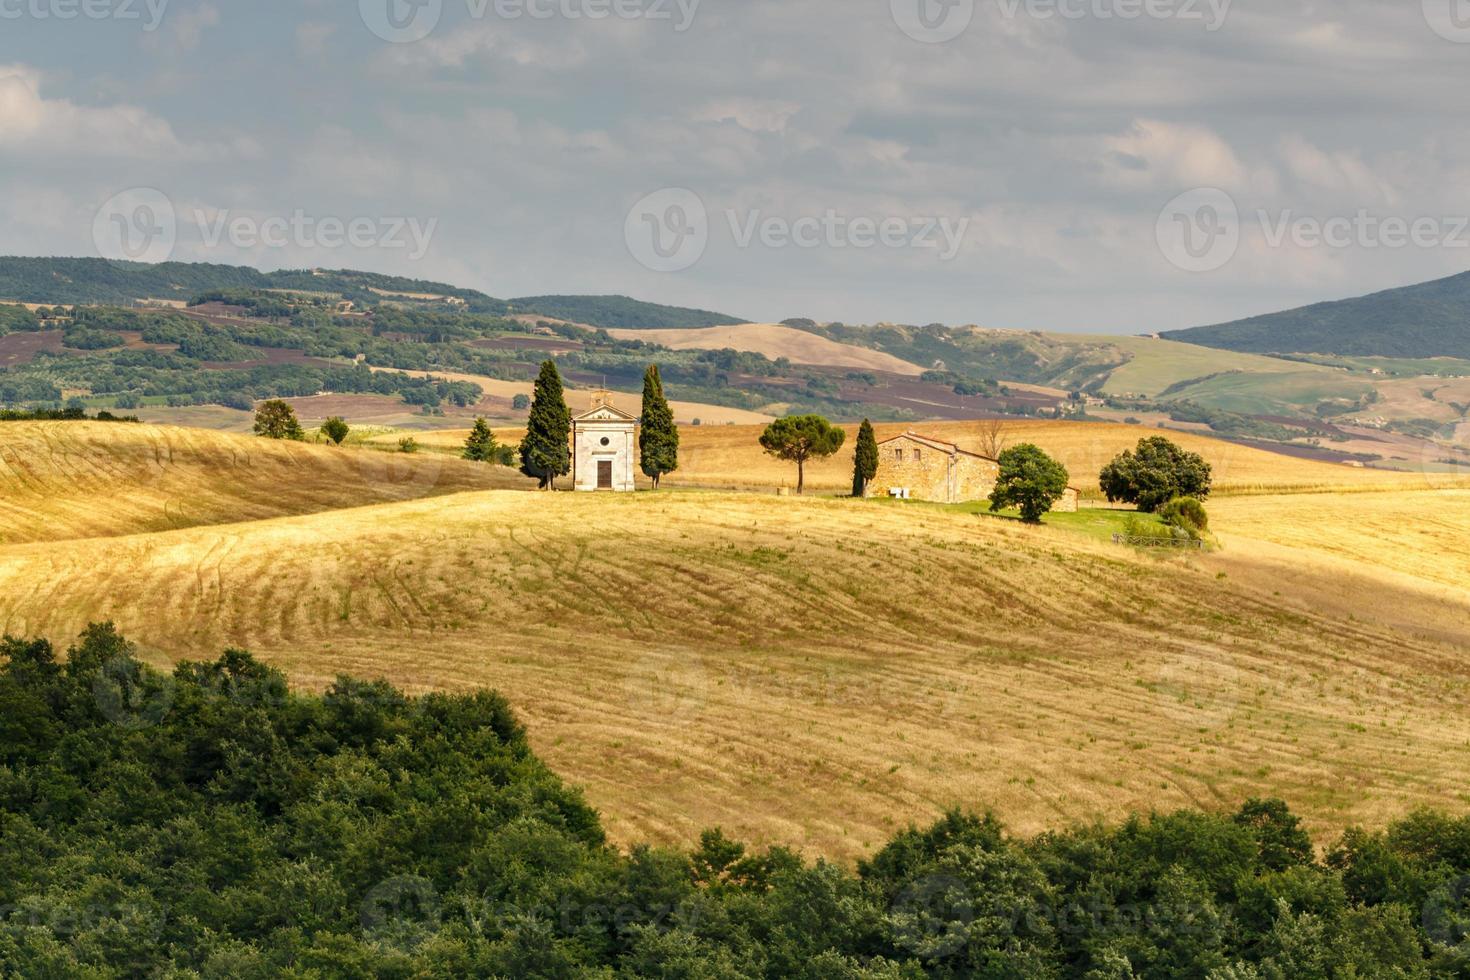 kapel in Toscane, Italië foto